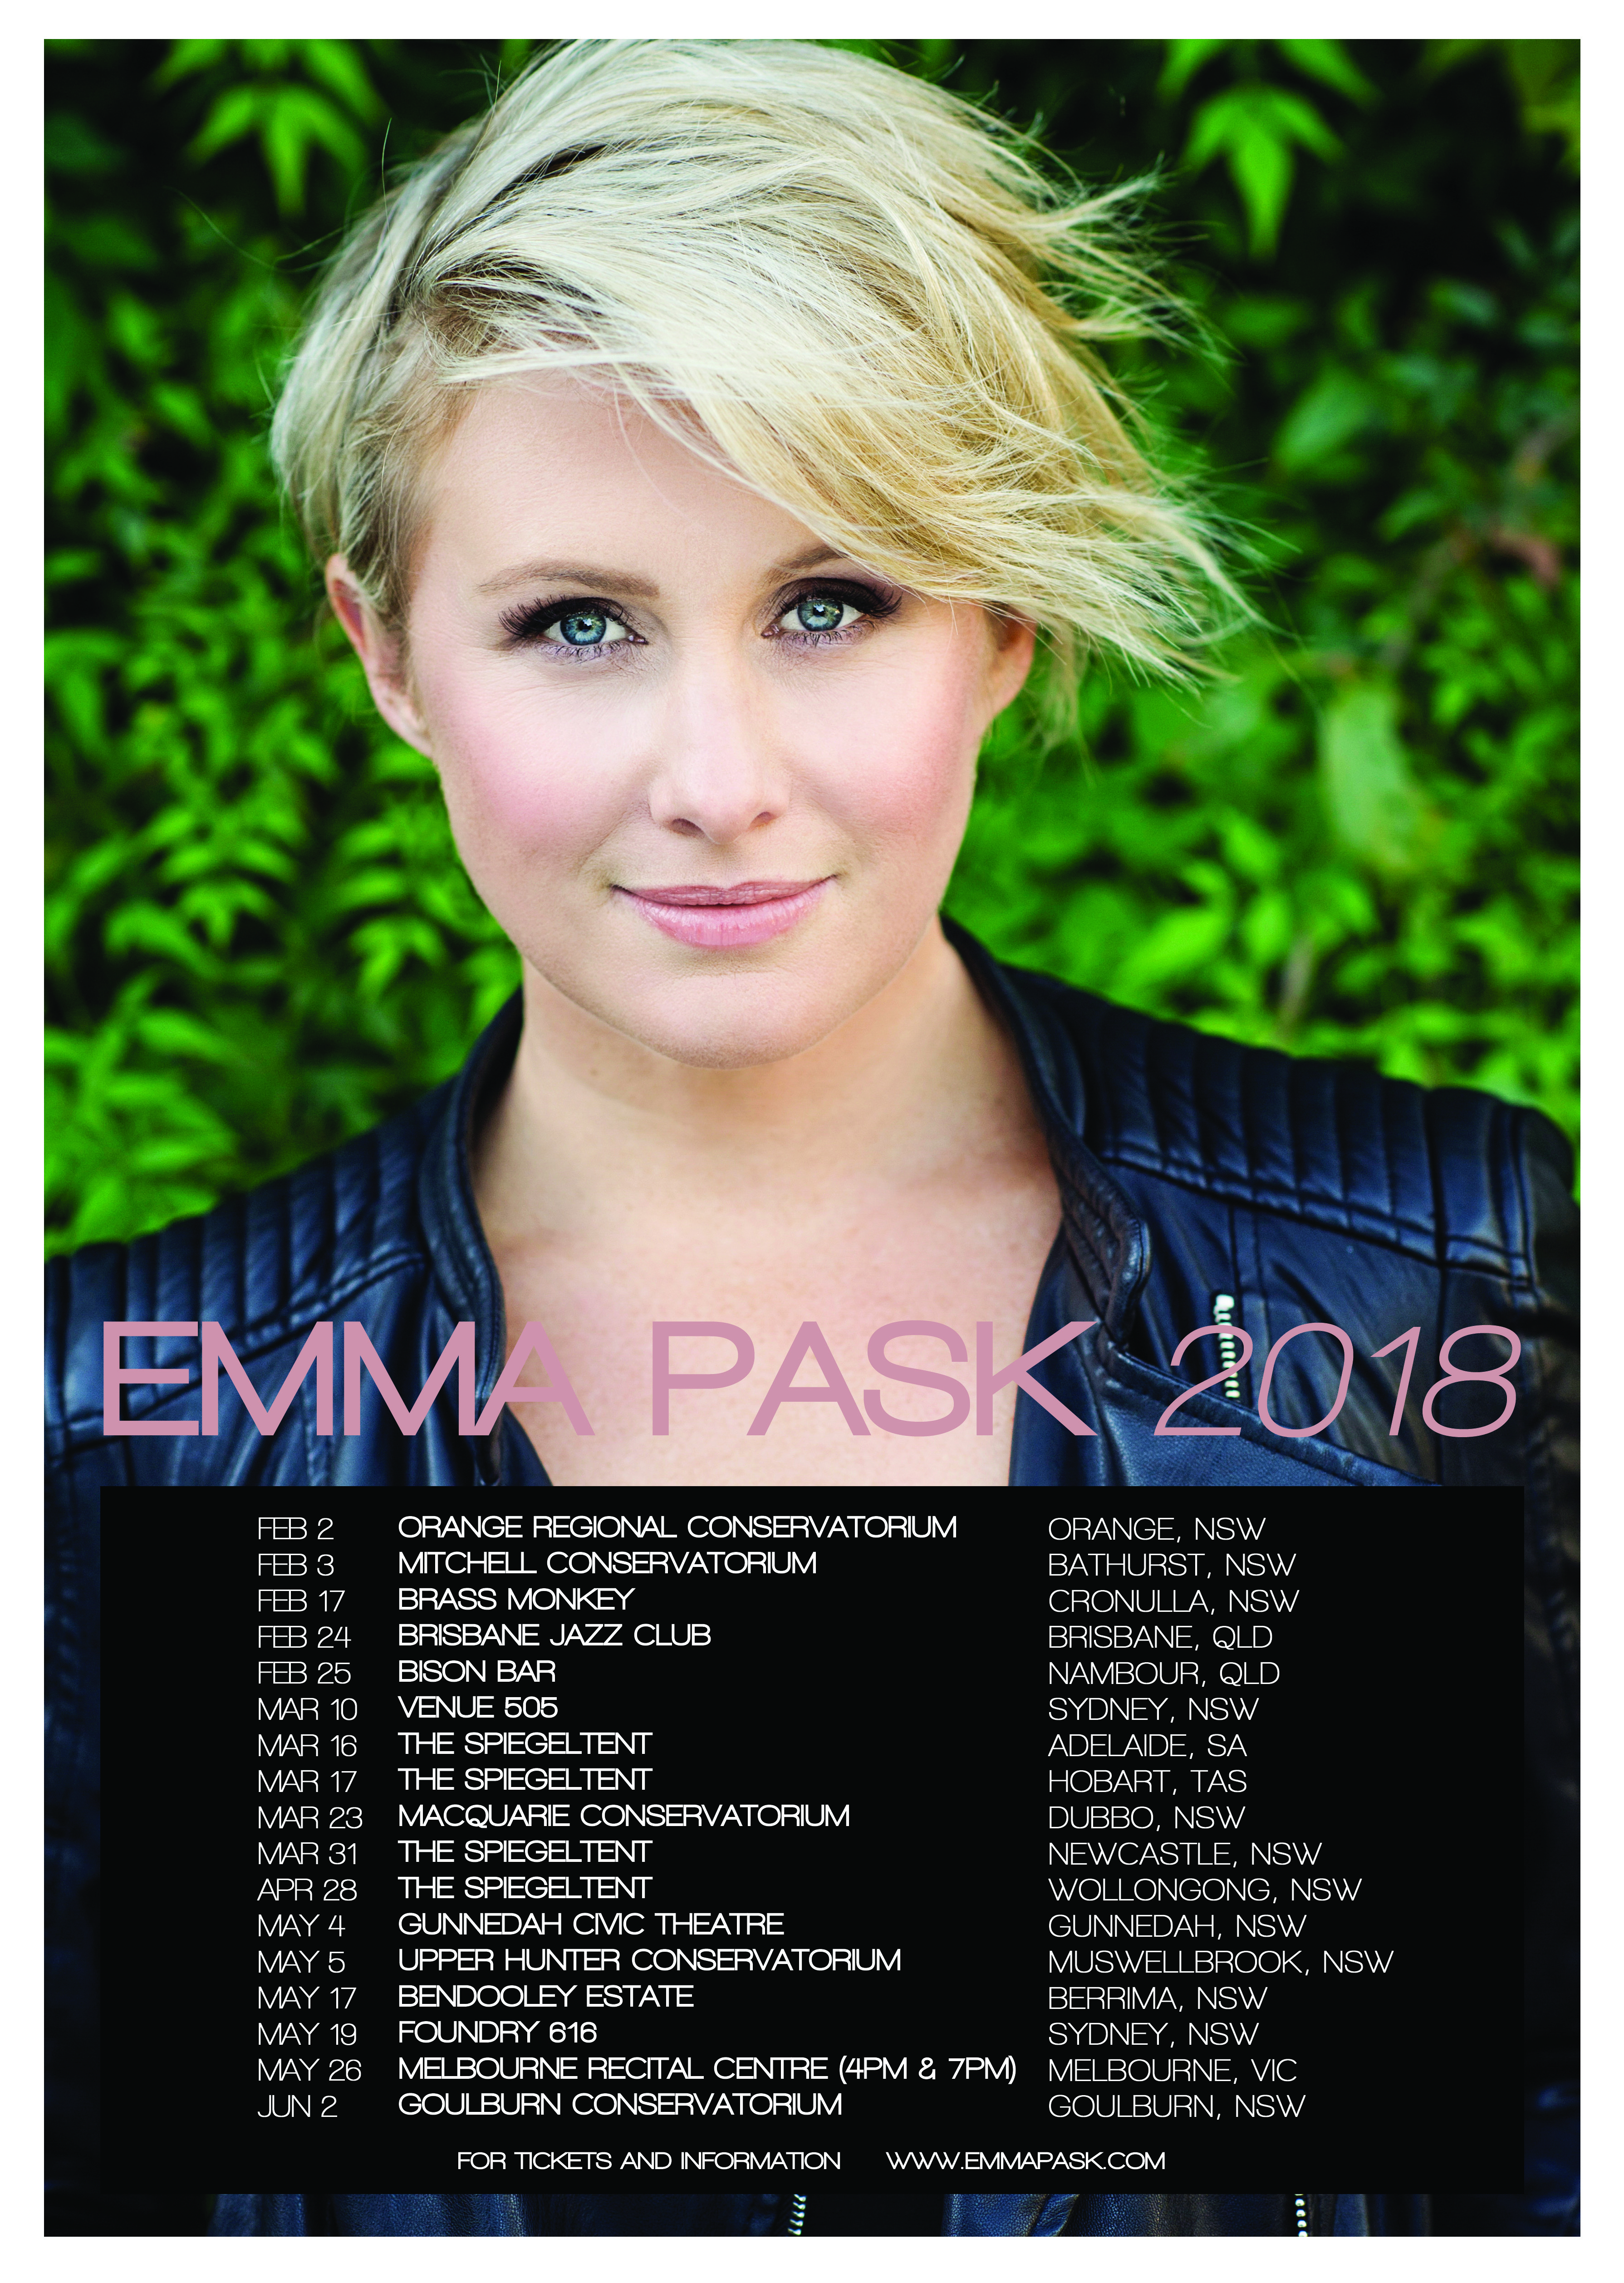 emma-pask-2018-pink